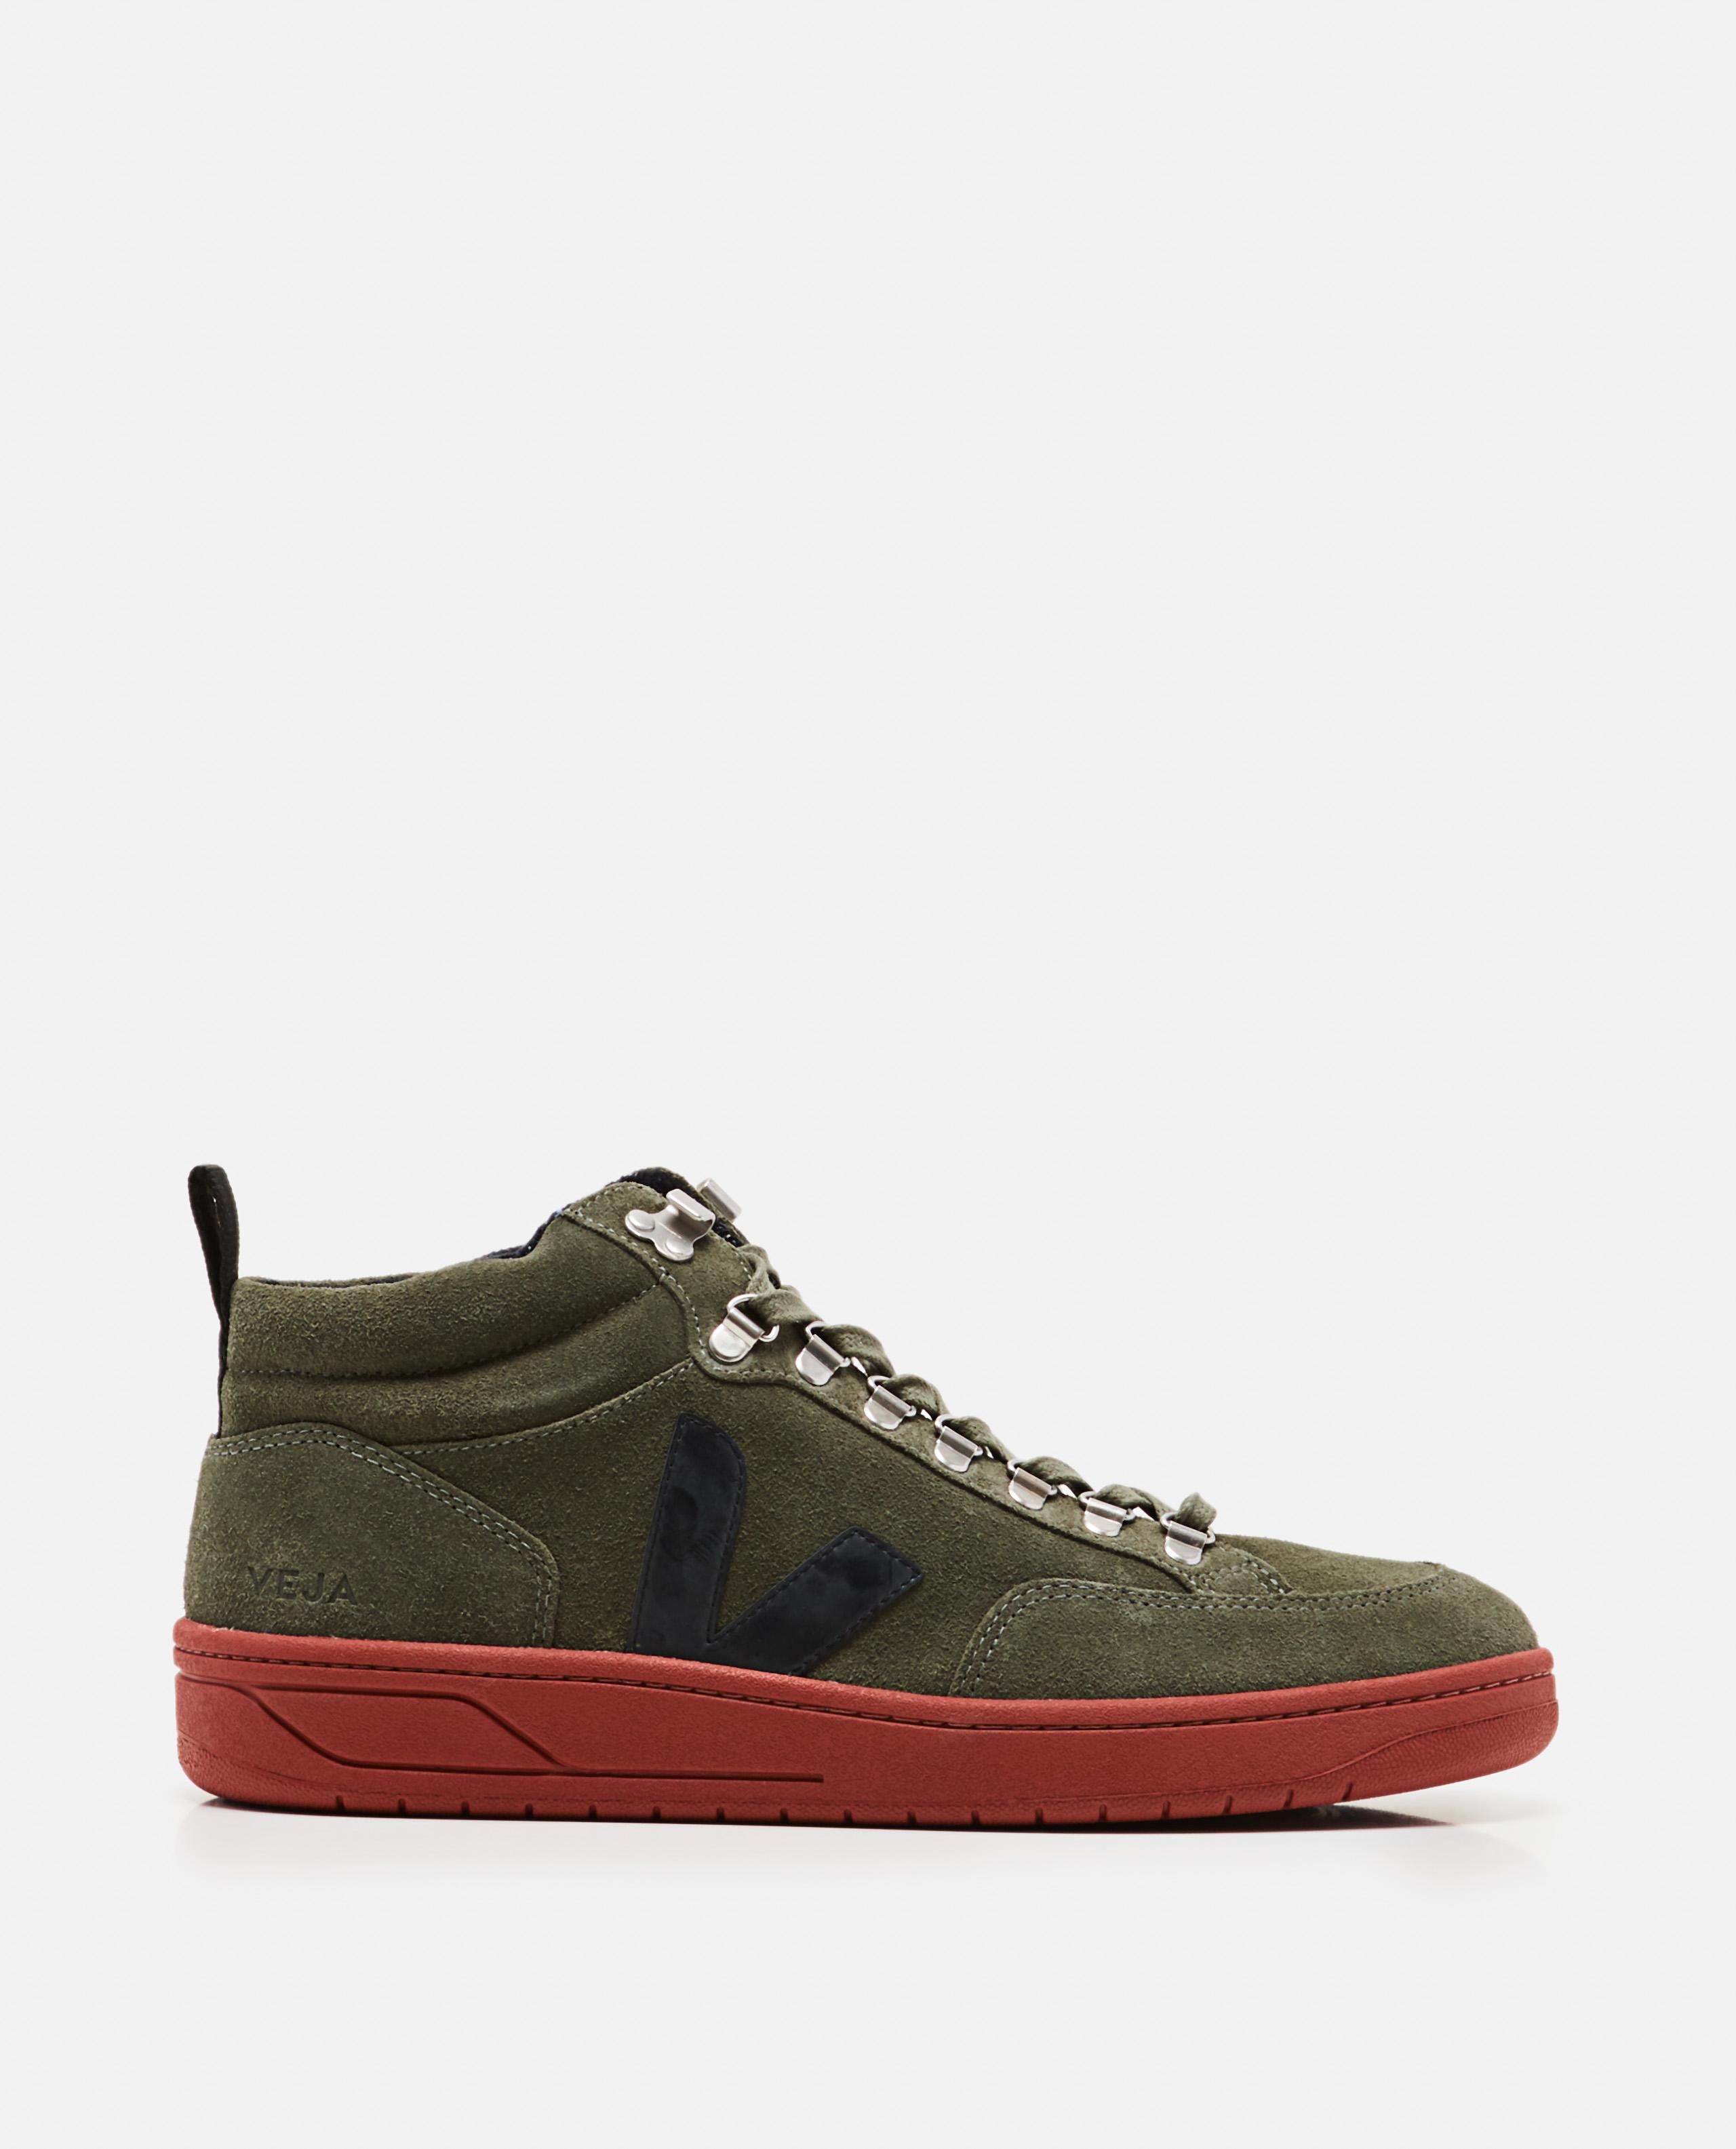 Roraima sneakers